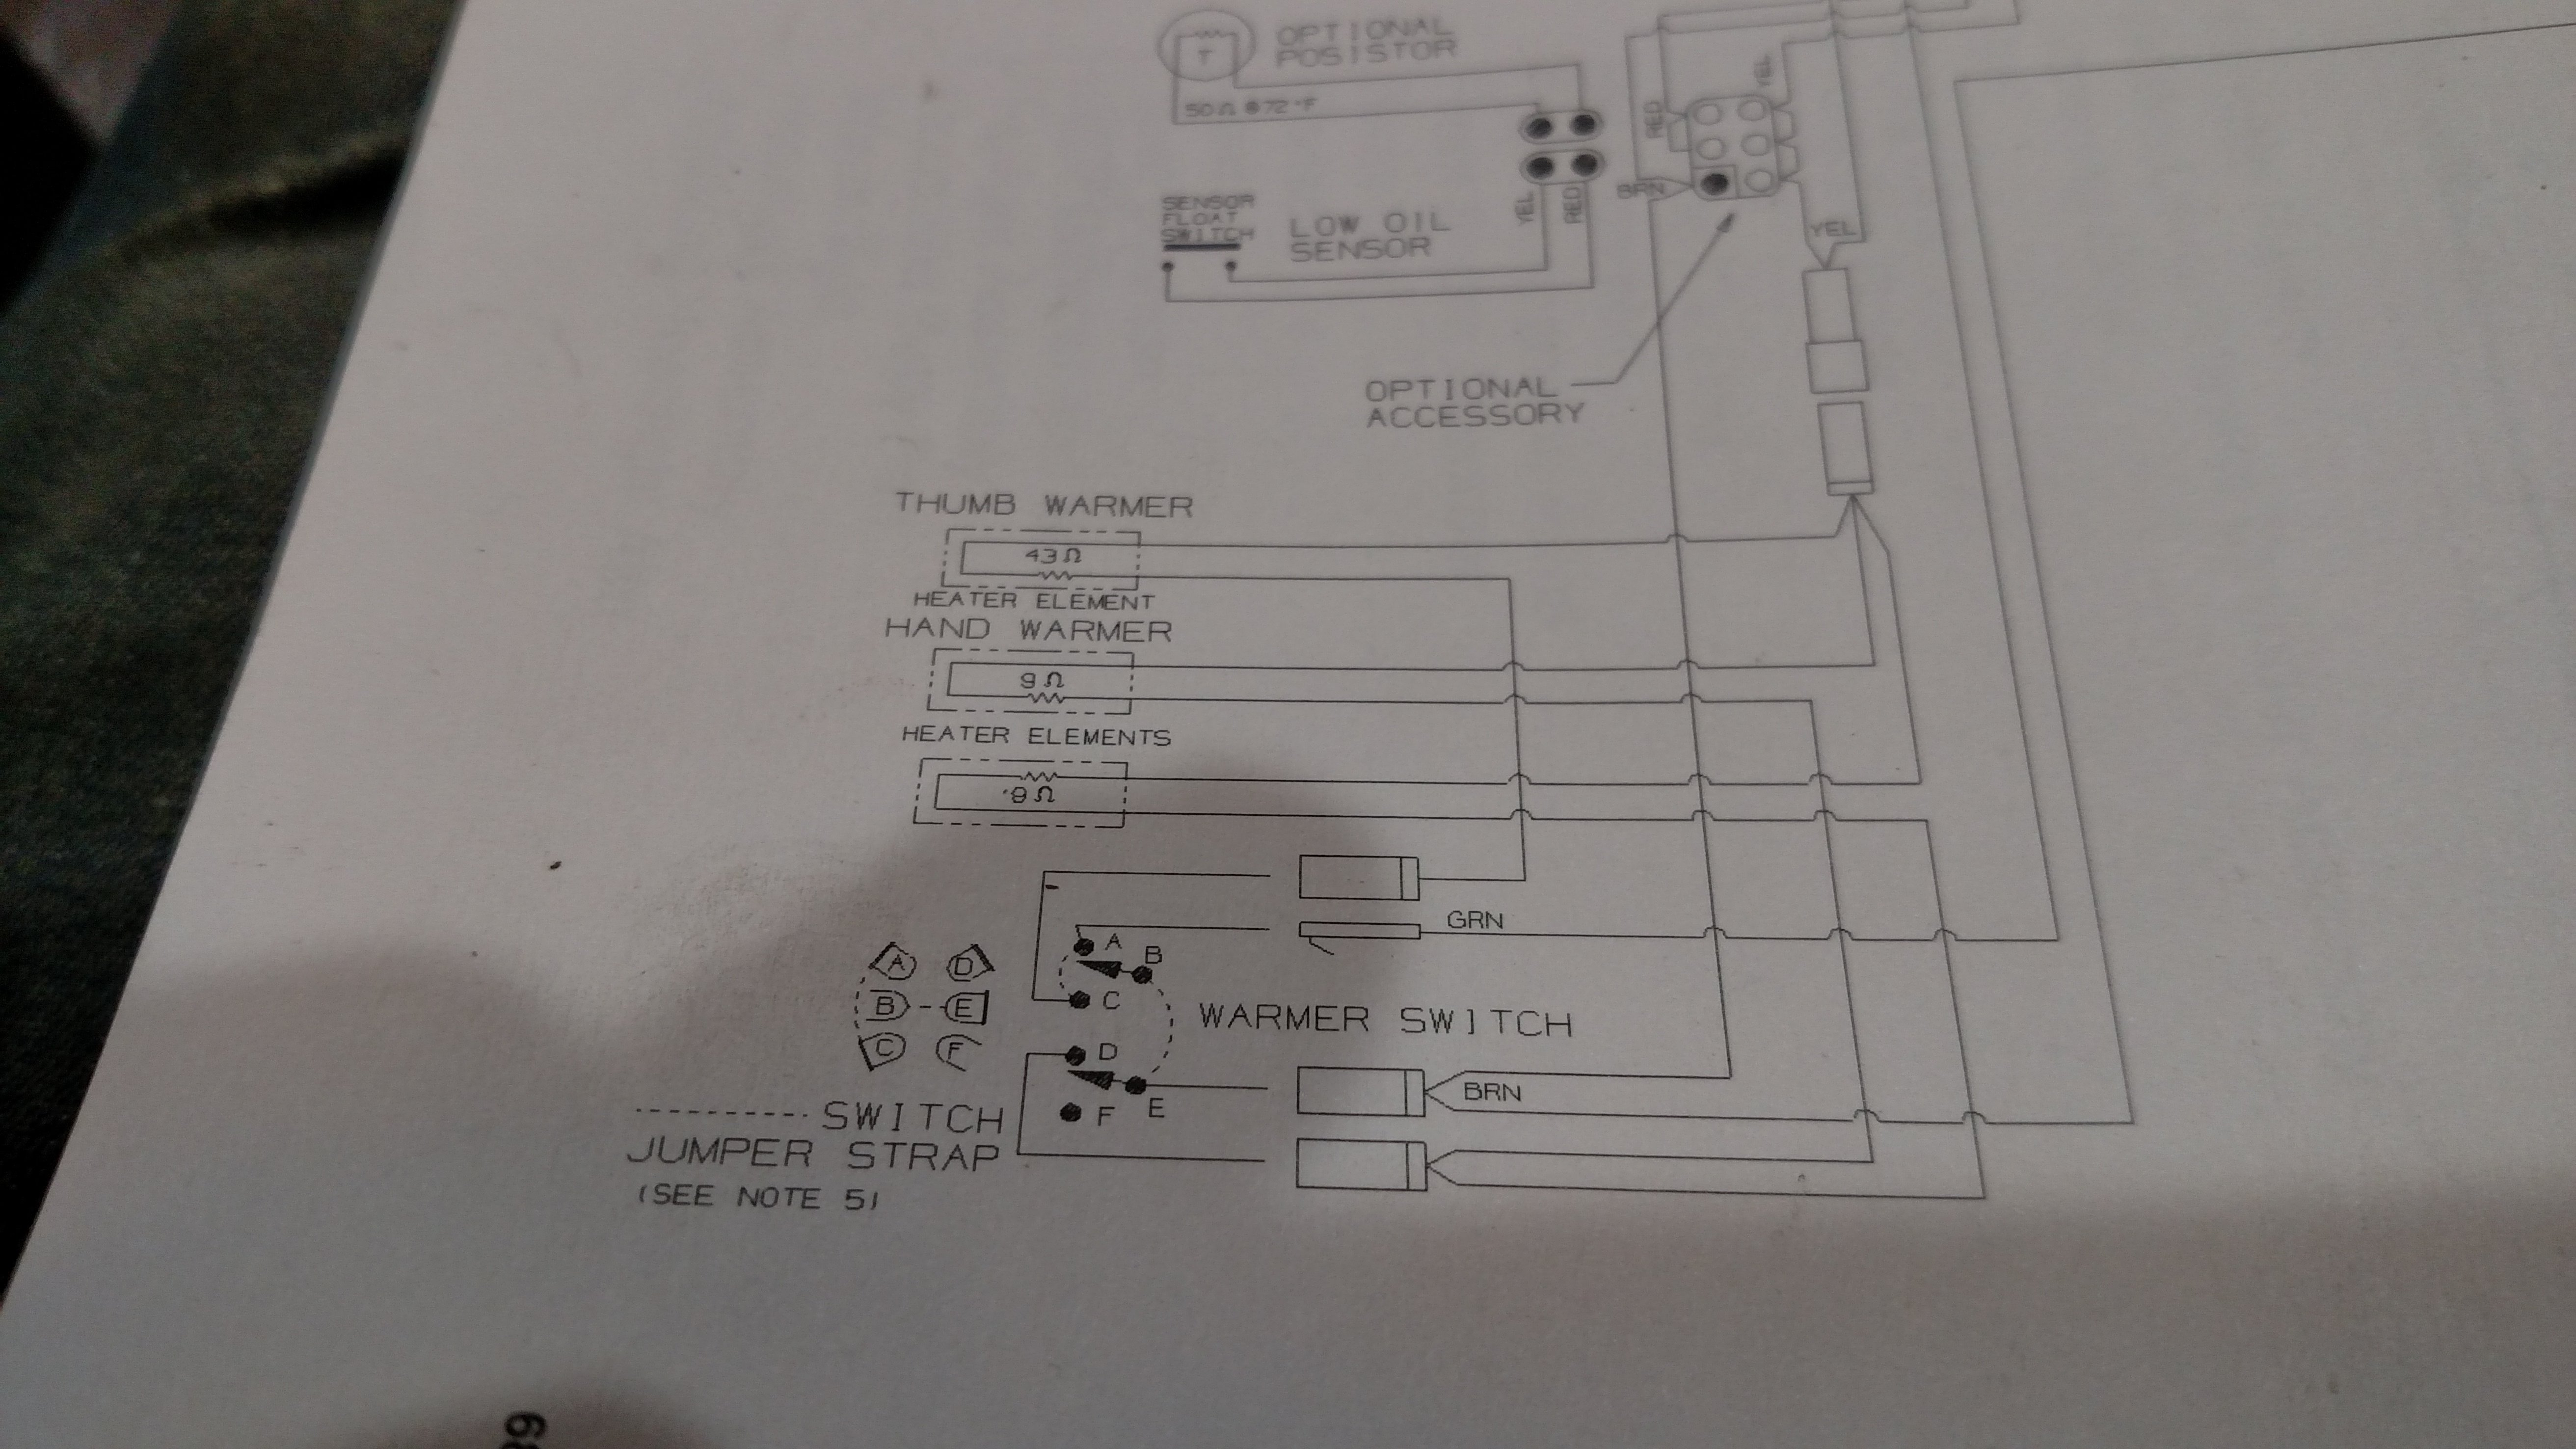 snowmobile hand warmers wiring diagram - Wiring Diagram